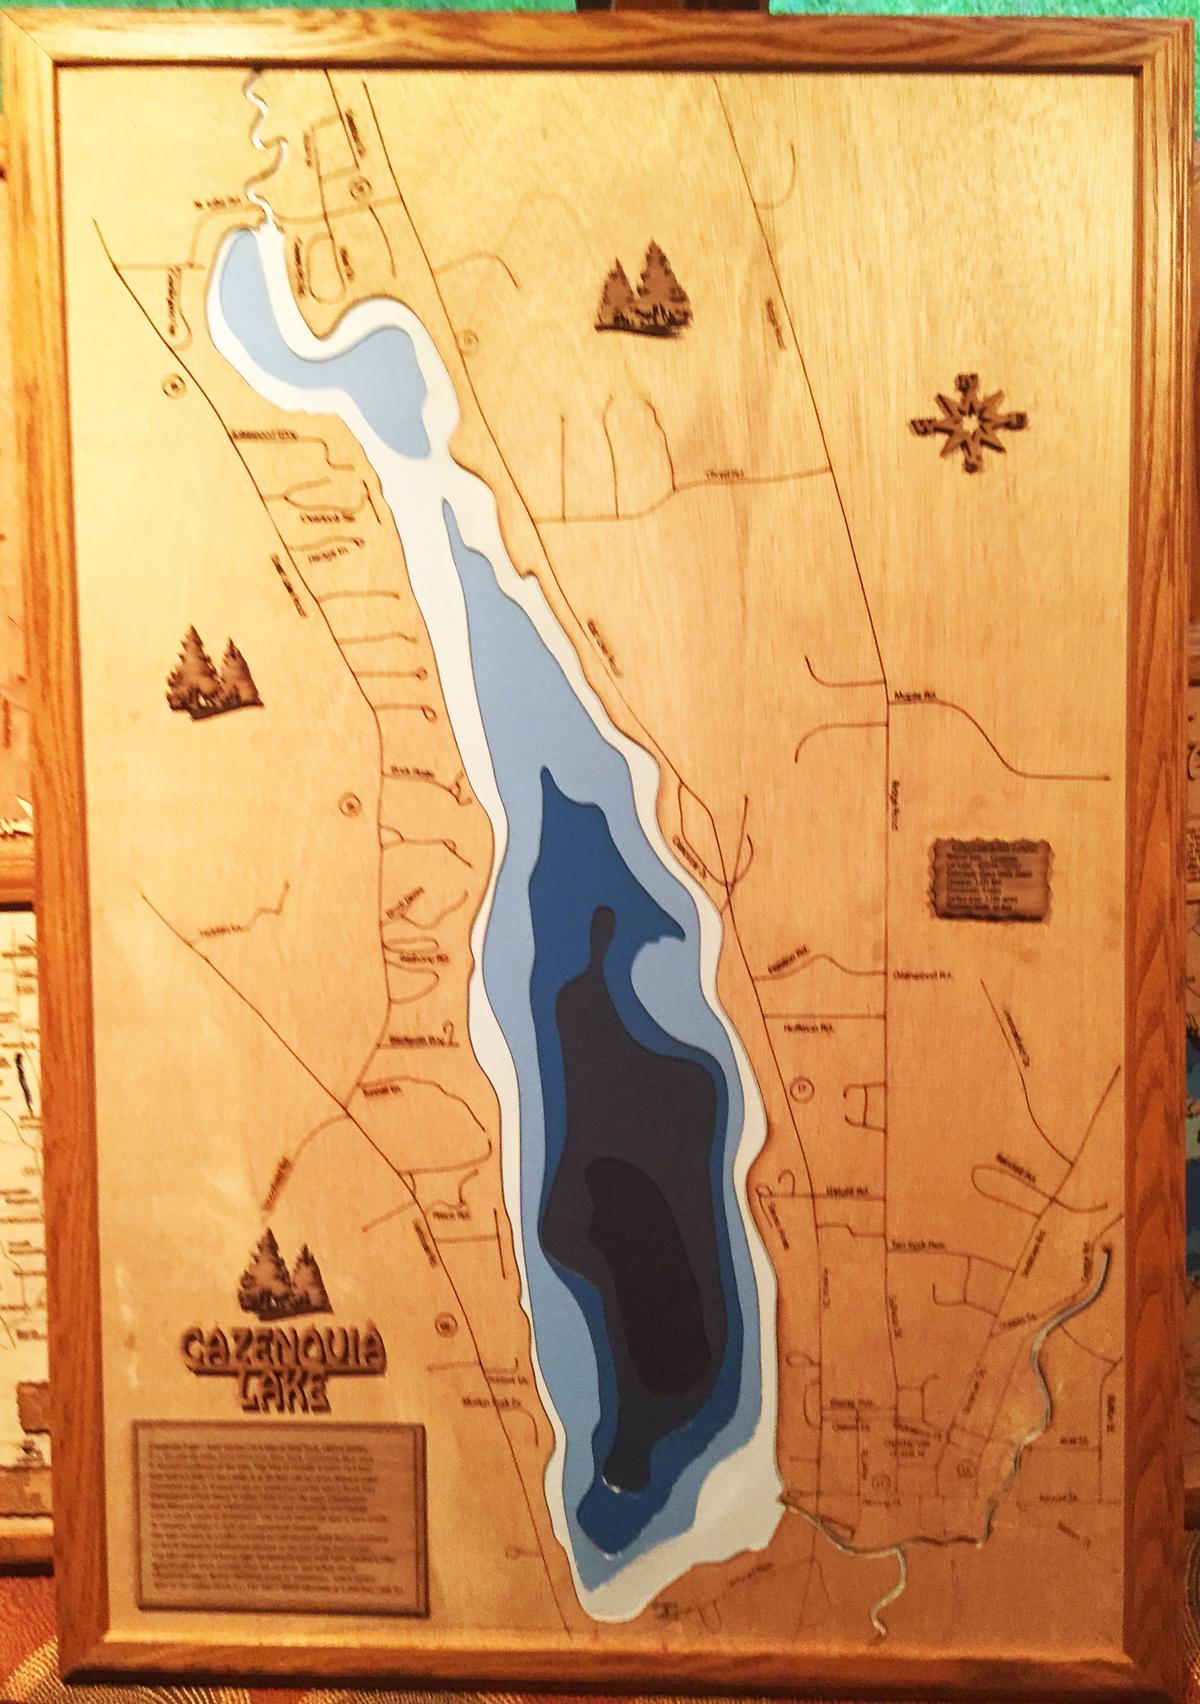 Cazenovia Lake